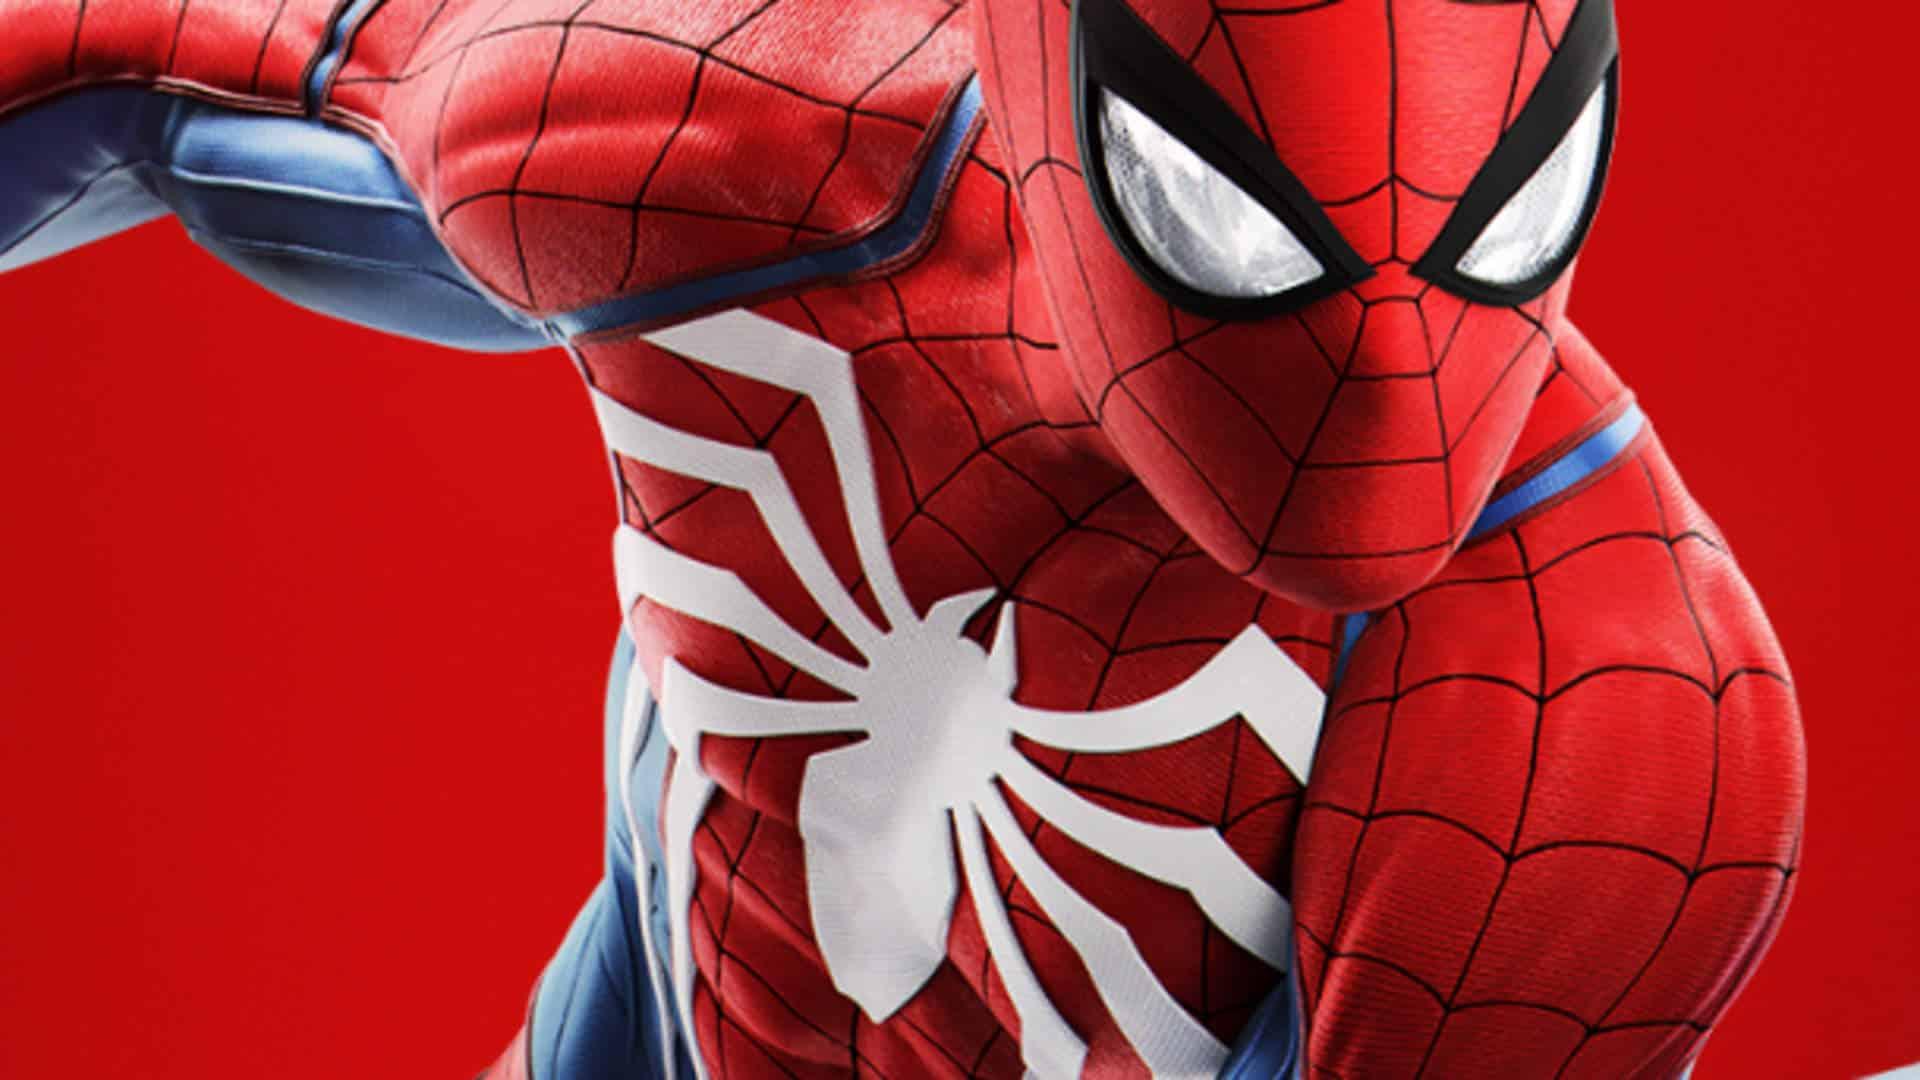 Marvels Avengers Spider Man PS4